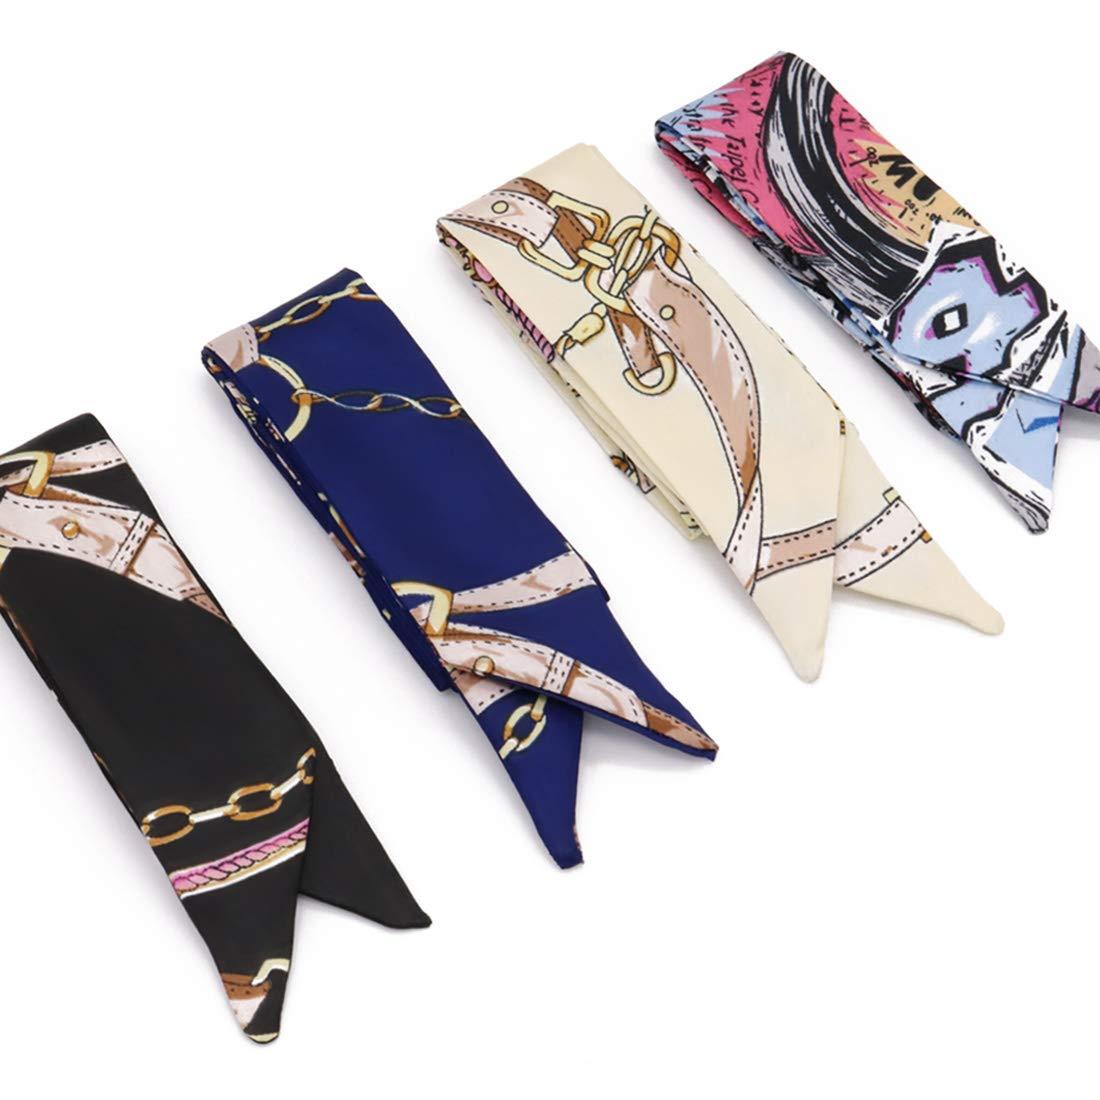 LibbyPet Bamboo Handbags for Women Handmade Bamboo Bag Summer Beach Tote bag (5pcs Scarves #2) by LibbyPet (Image #4)